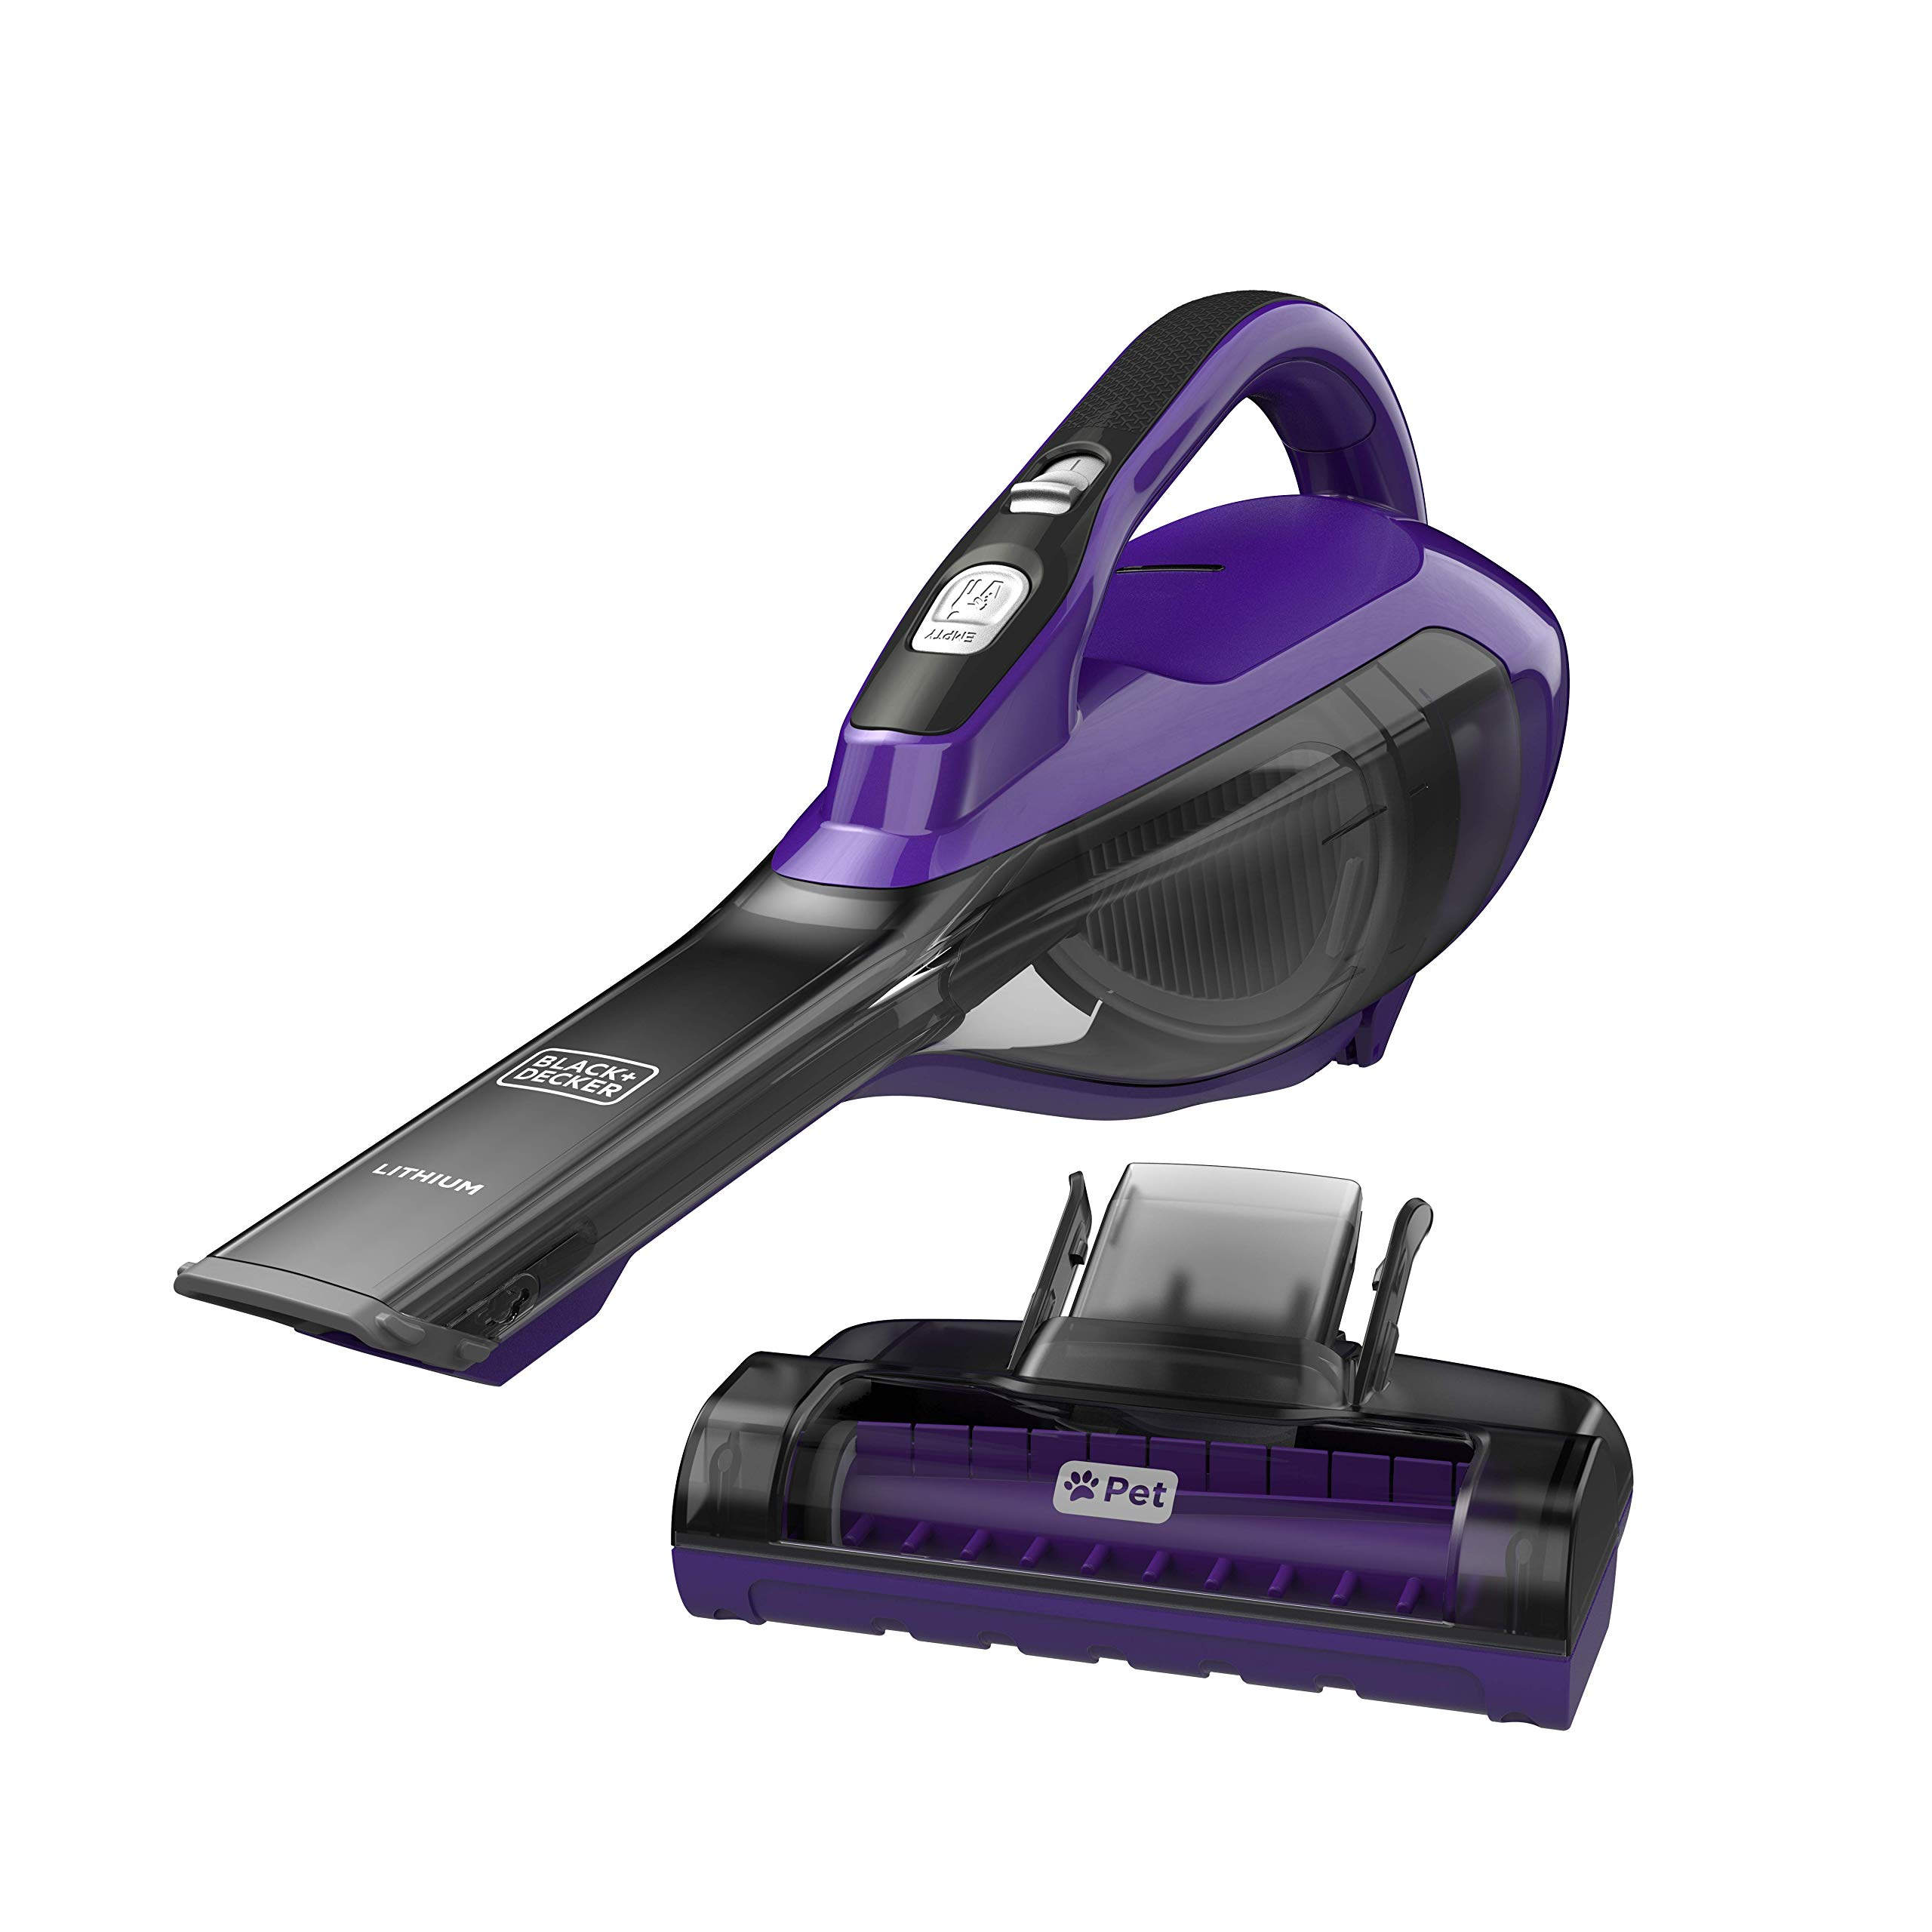 BLACK+DECKER Pet dustbuster Handheld Vacuum, Cordless, Purple (HLVA325JP07) by BLACK+DECKER